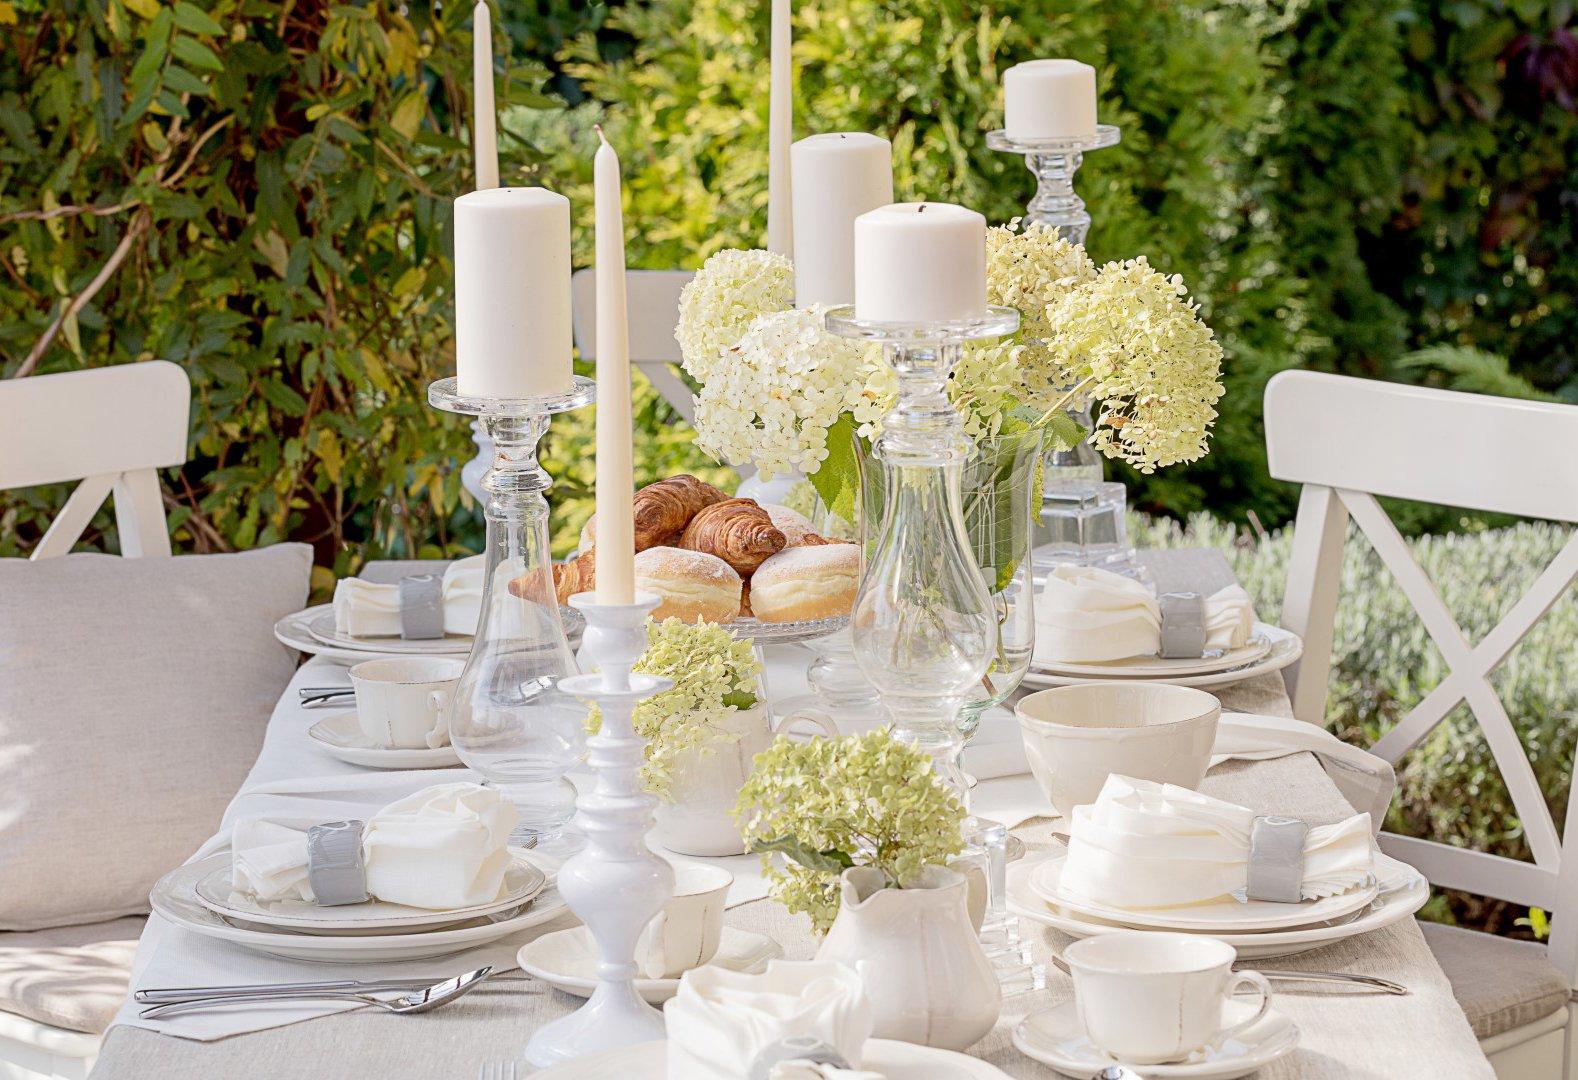 Garden Afternoon Tea Party in White